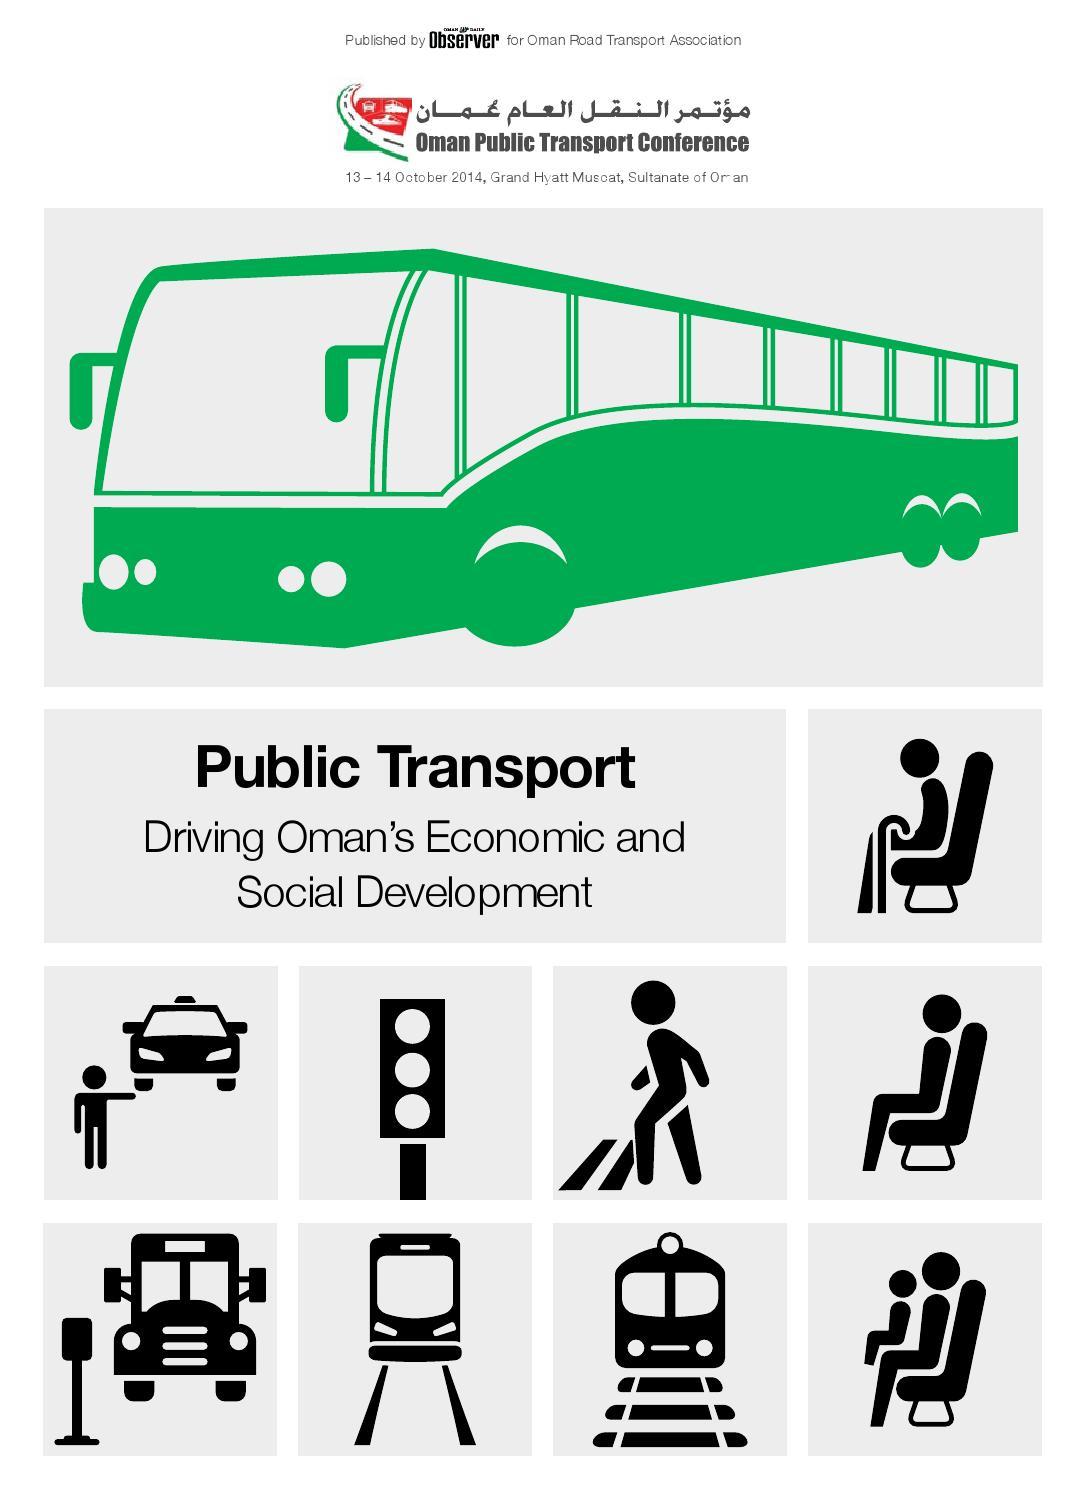 Oman Public Transport Conference Publication by Oman